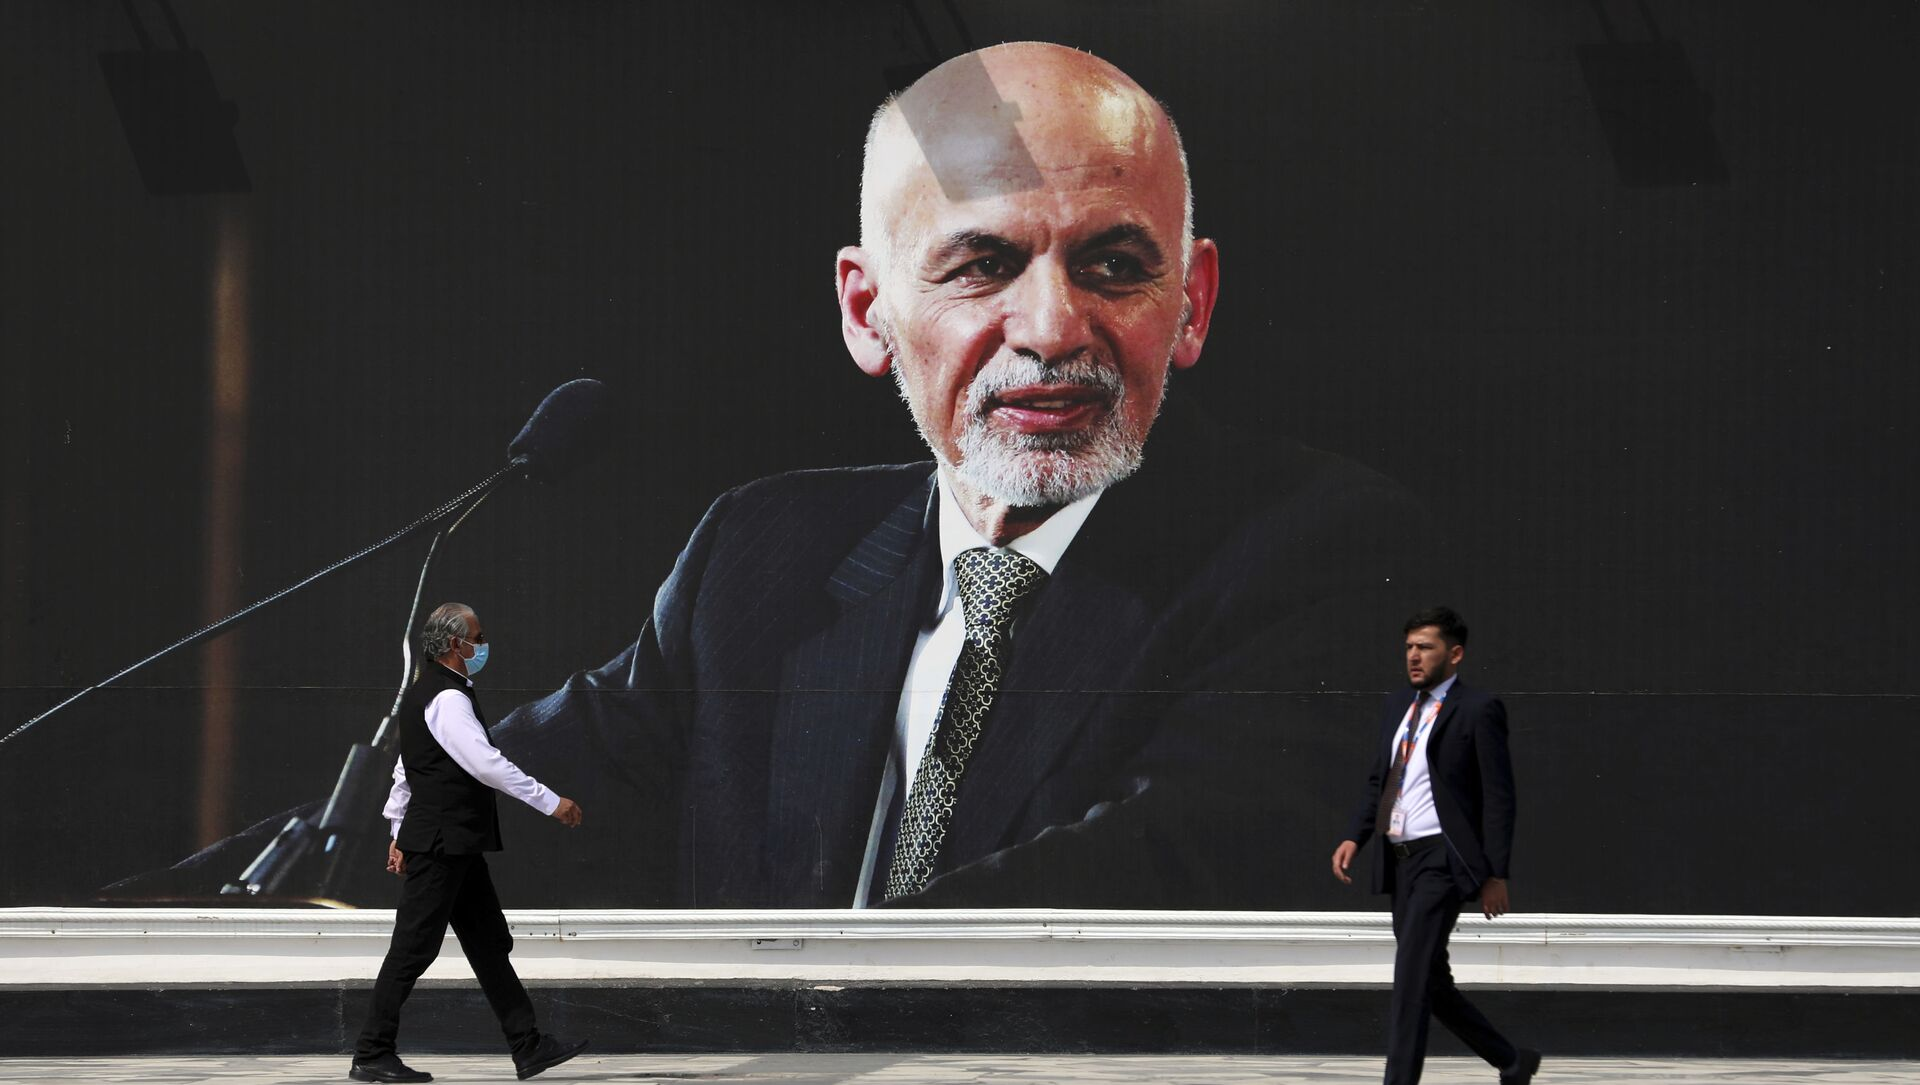 Люди проходят пере плакатом президента Афганистана Ашрафа Гани, фото из архива - Sputnik Азербайджан, 1920, 16.08.2021